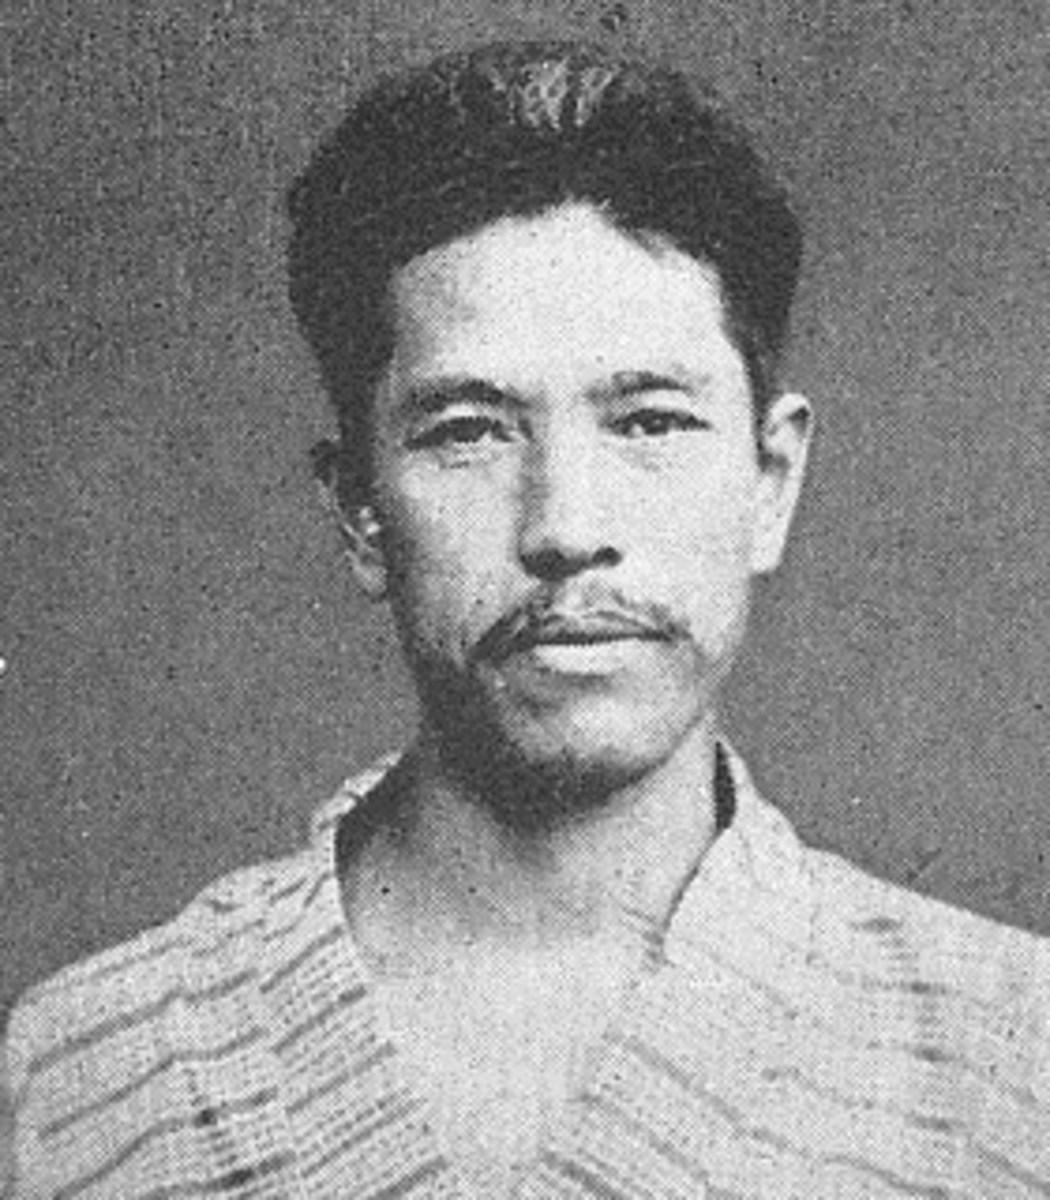 Kozaburō Tachibana